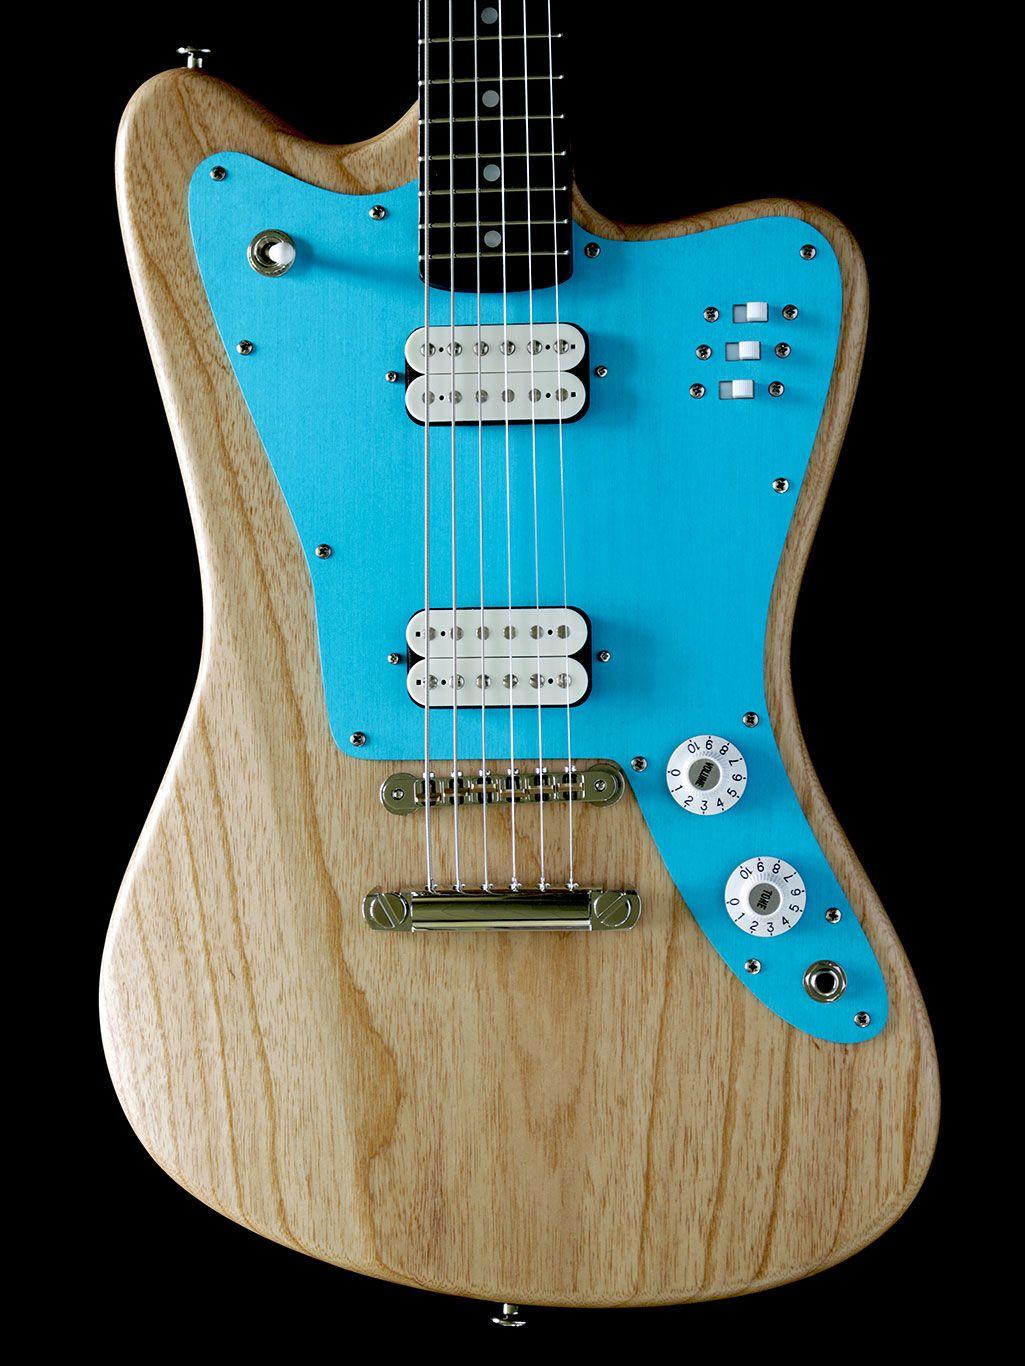 #SP-2 Headless TeleWoody | Electric guitar, Building